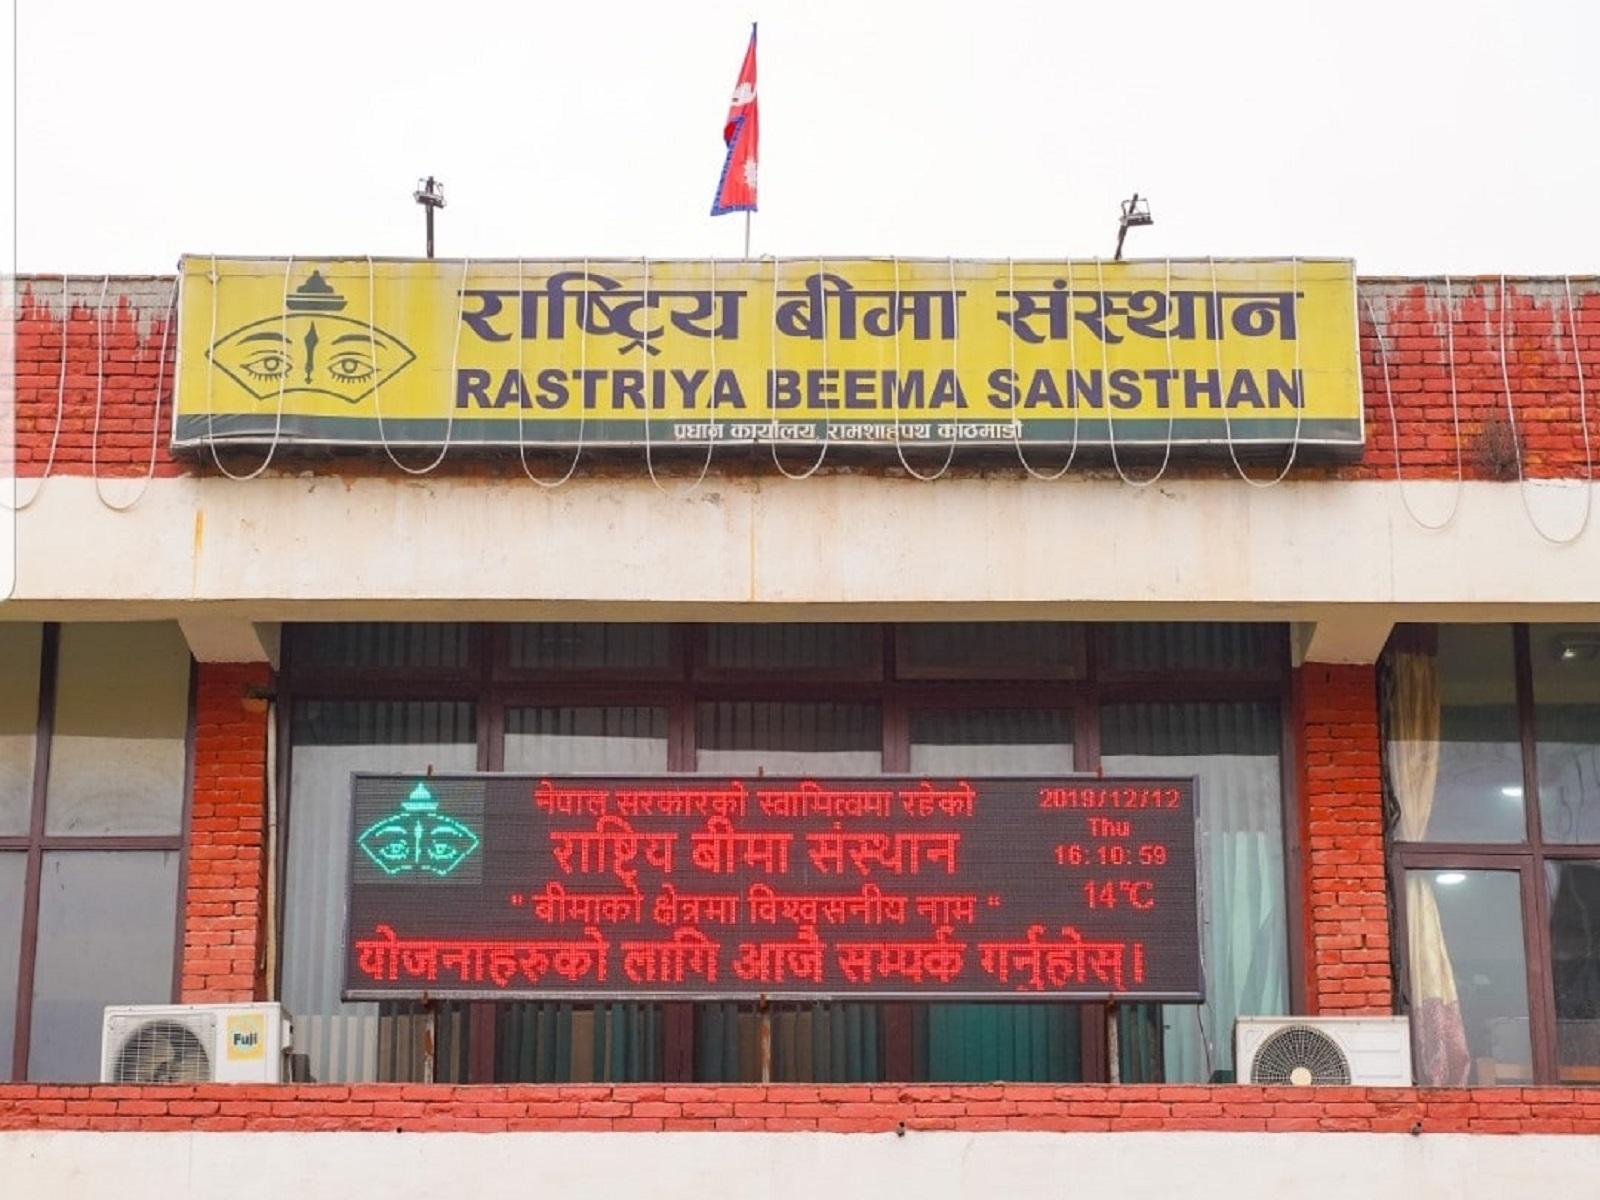 Rastriya Beema Sansthan